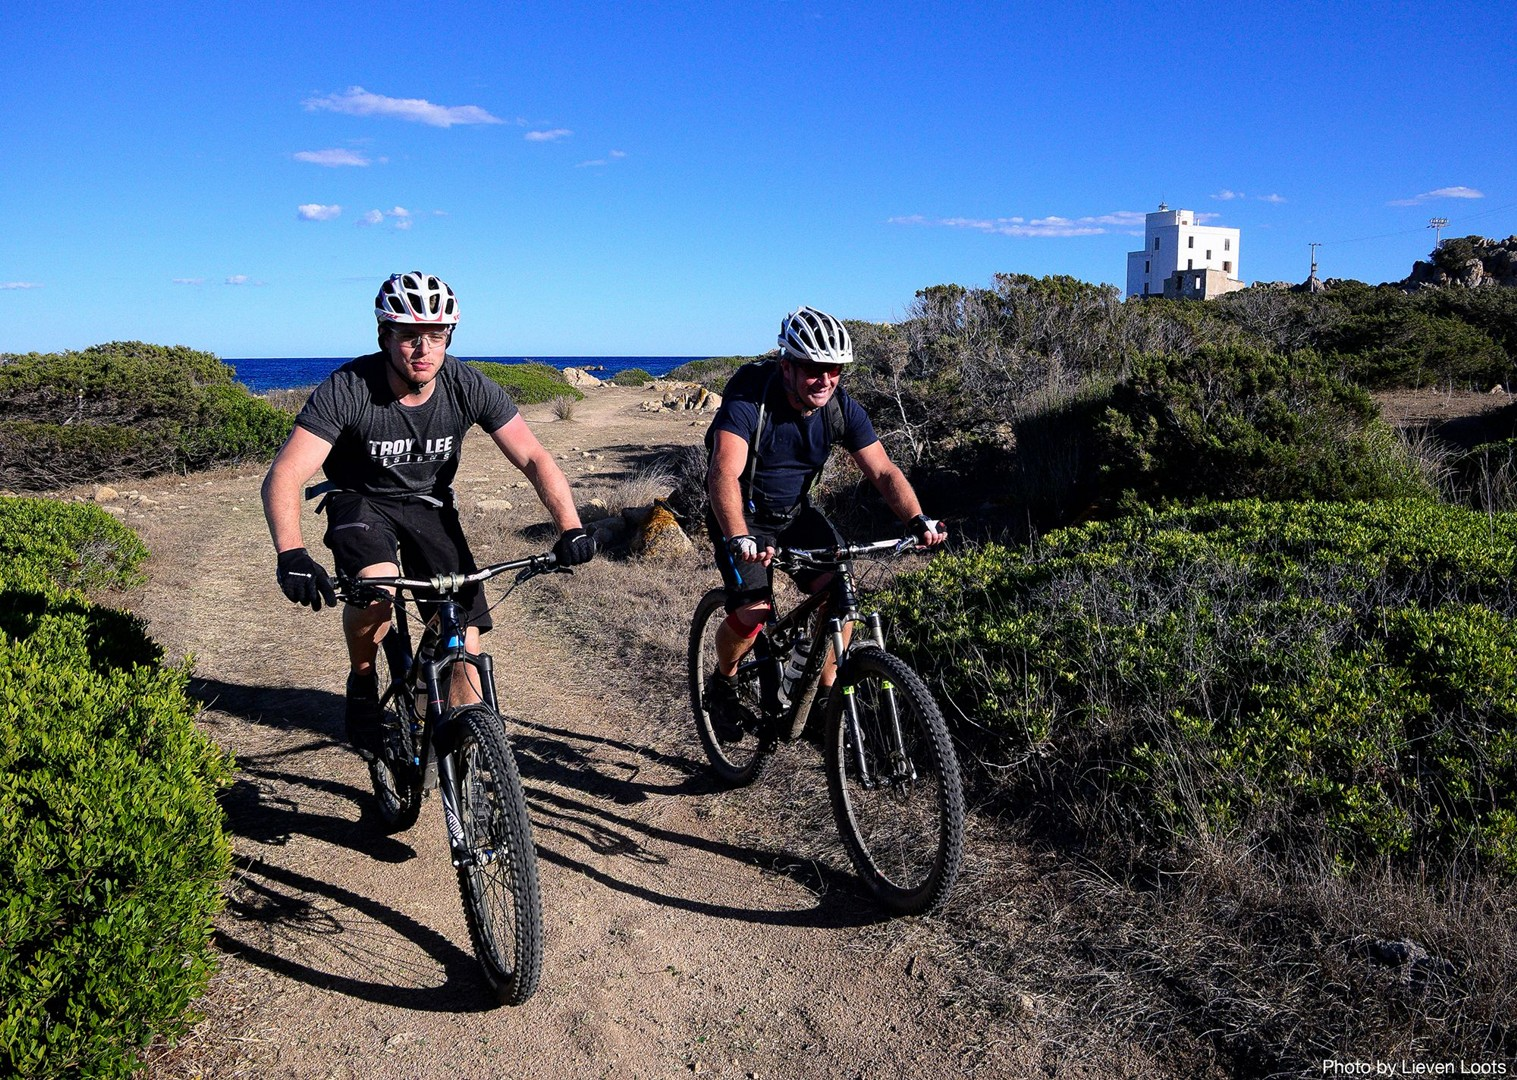 singletrack-below-perde-liana-pinnacle-mountain-biking-holiday-in-sardinia-traverse.jpg - Sardinia - Sardinia Traverse - Guided Mountain Bike Holiday - Mountain Biking